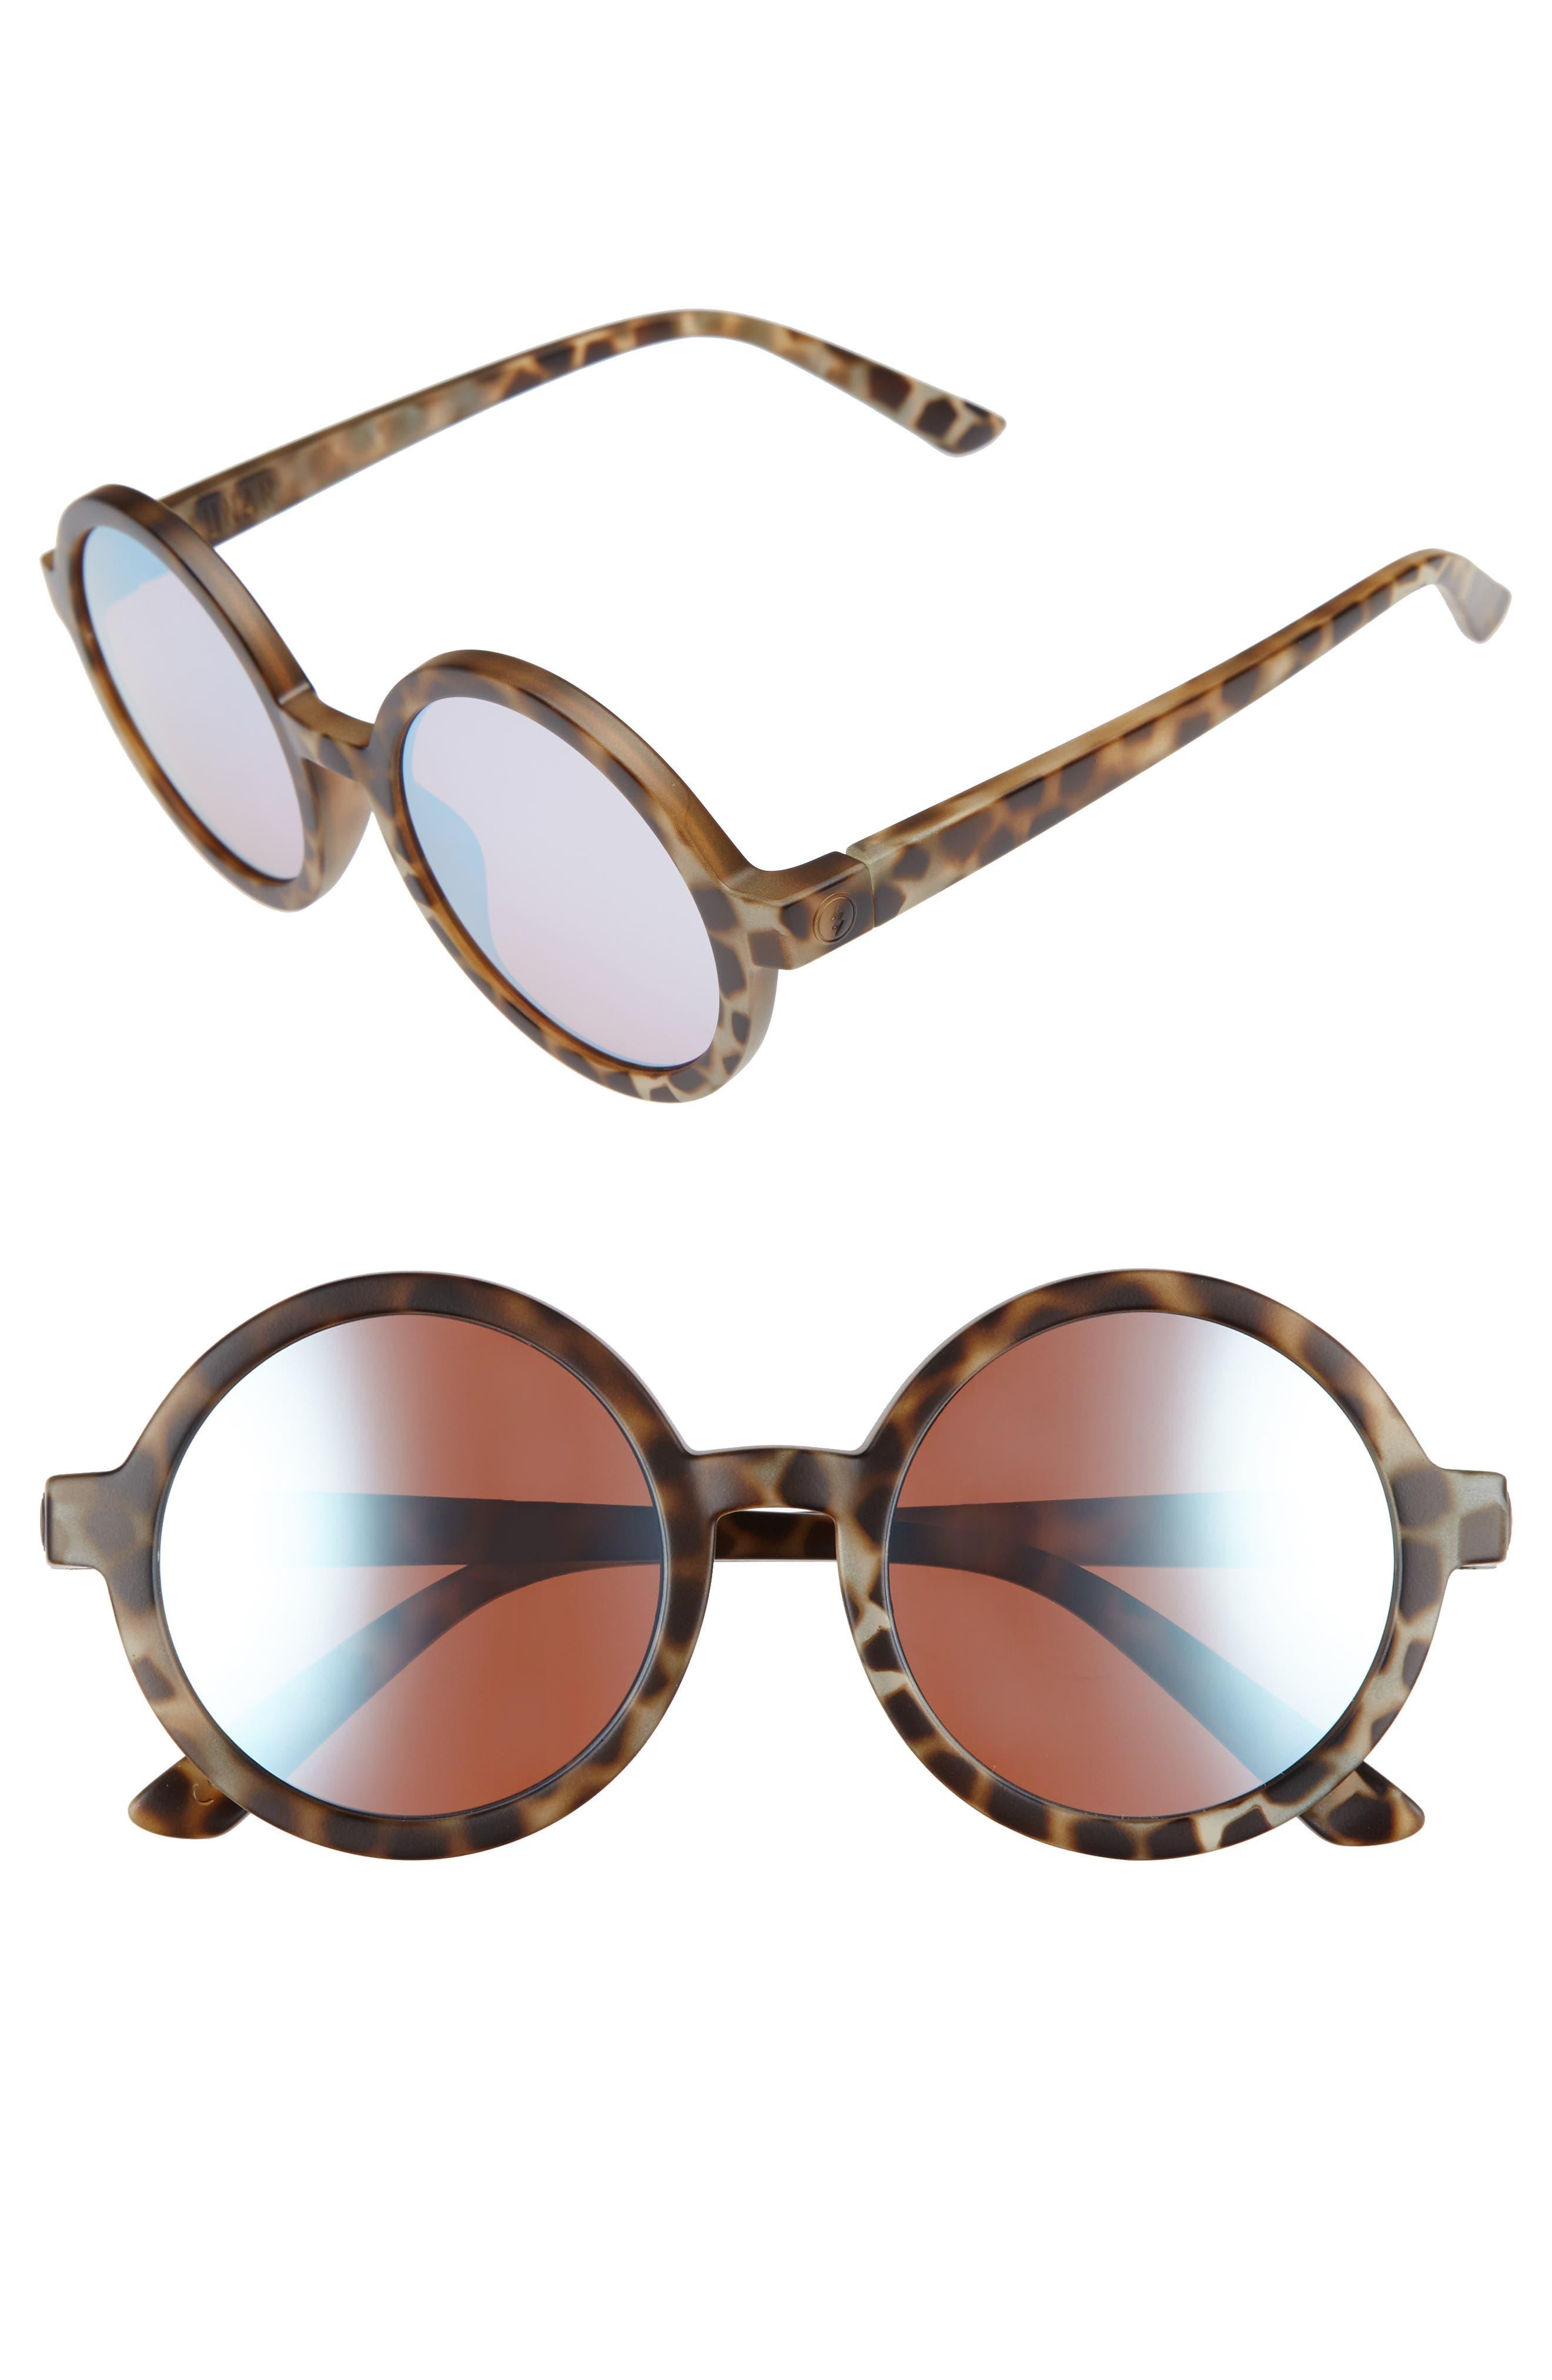 Lunar 52mm Round Sunglasses,                         Main,                         color, 250